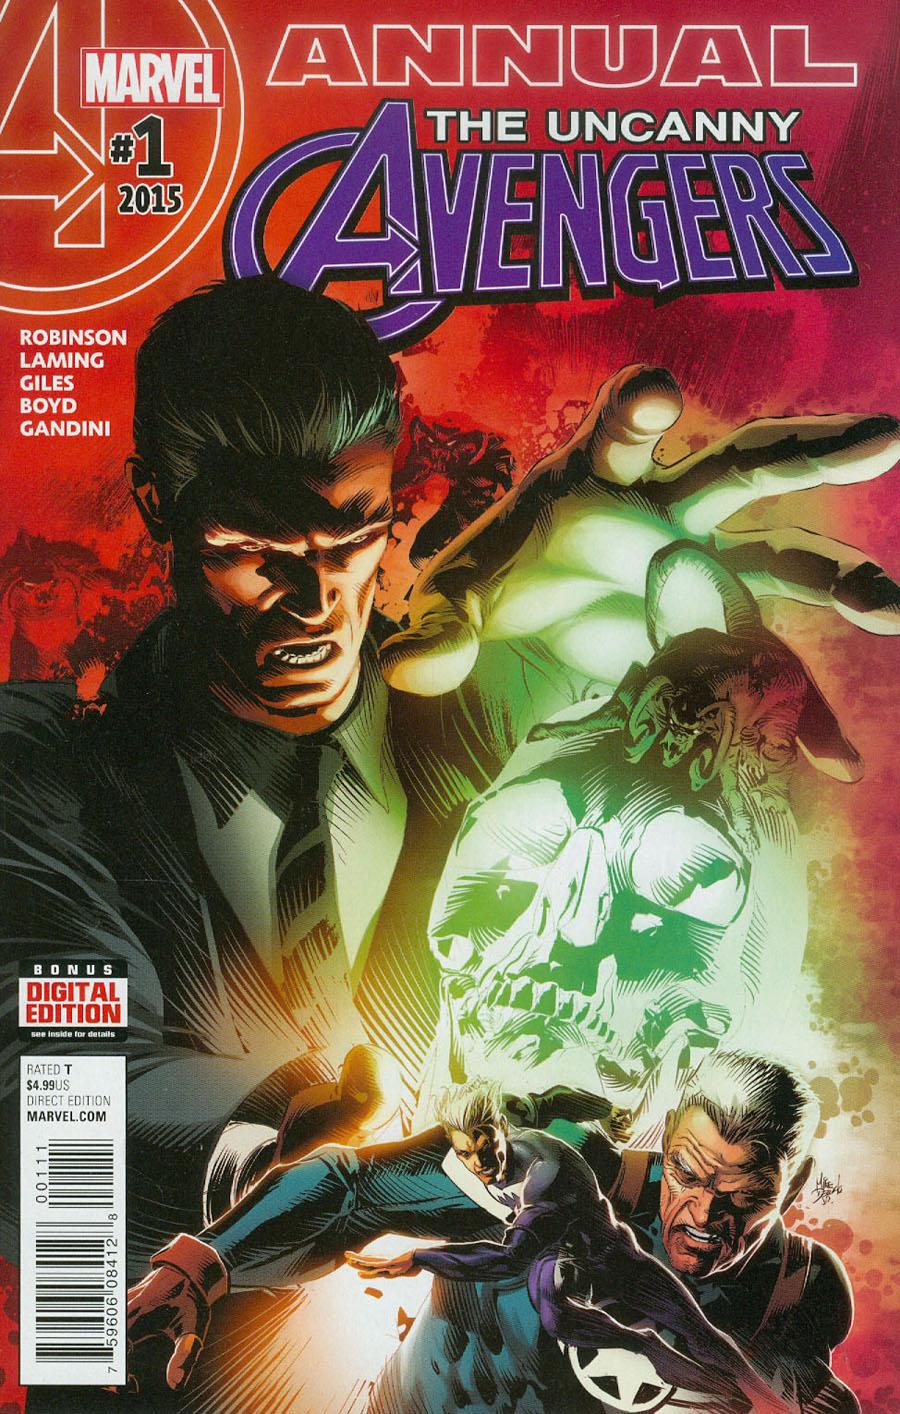 Uncanny Avengers Vol 3 Annual #1